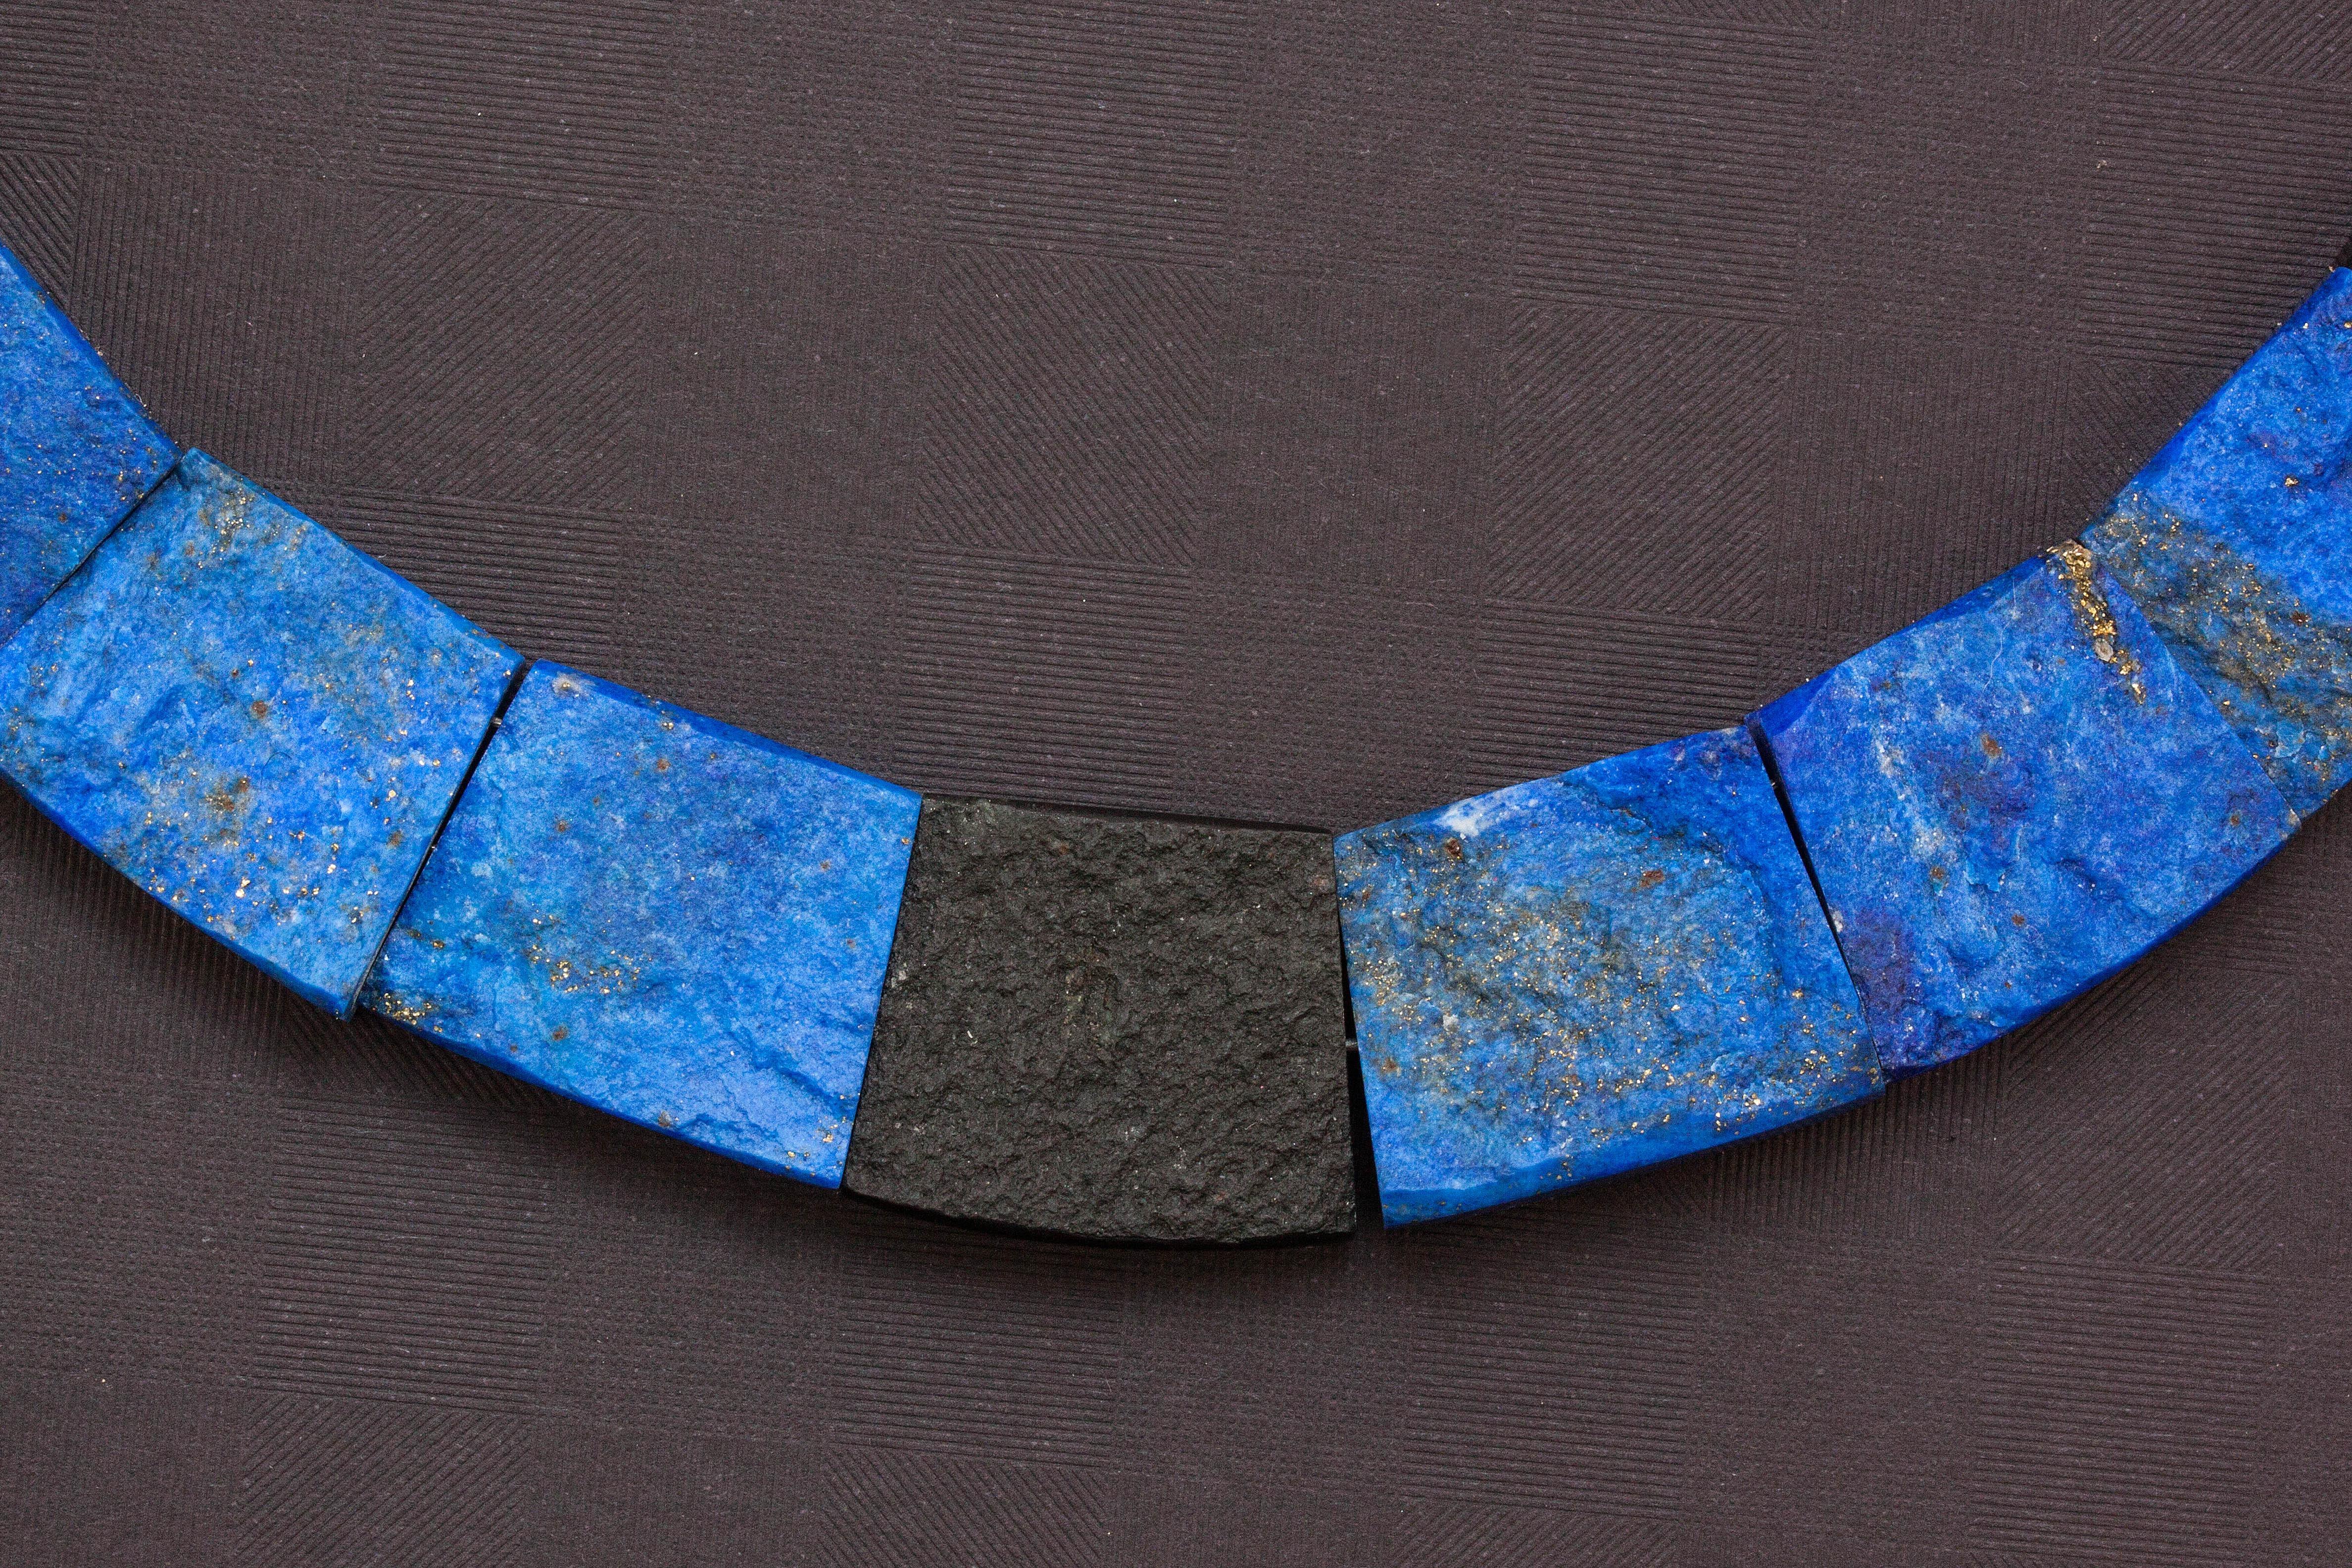 Fotos gratis : rock, cadena, patrón, azul, ropa, collar, joyería ...